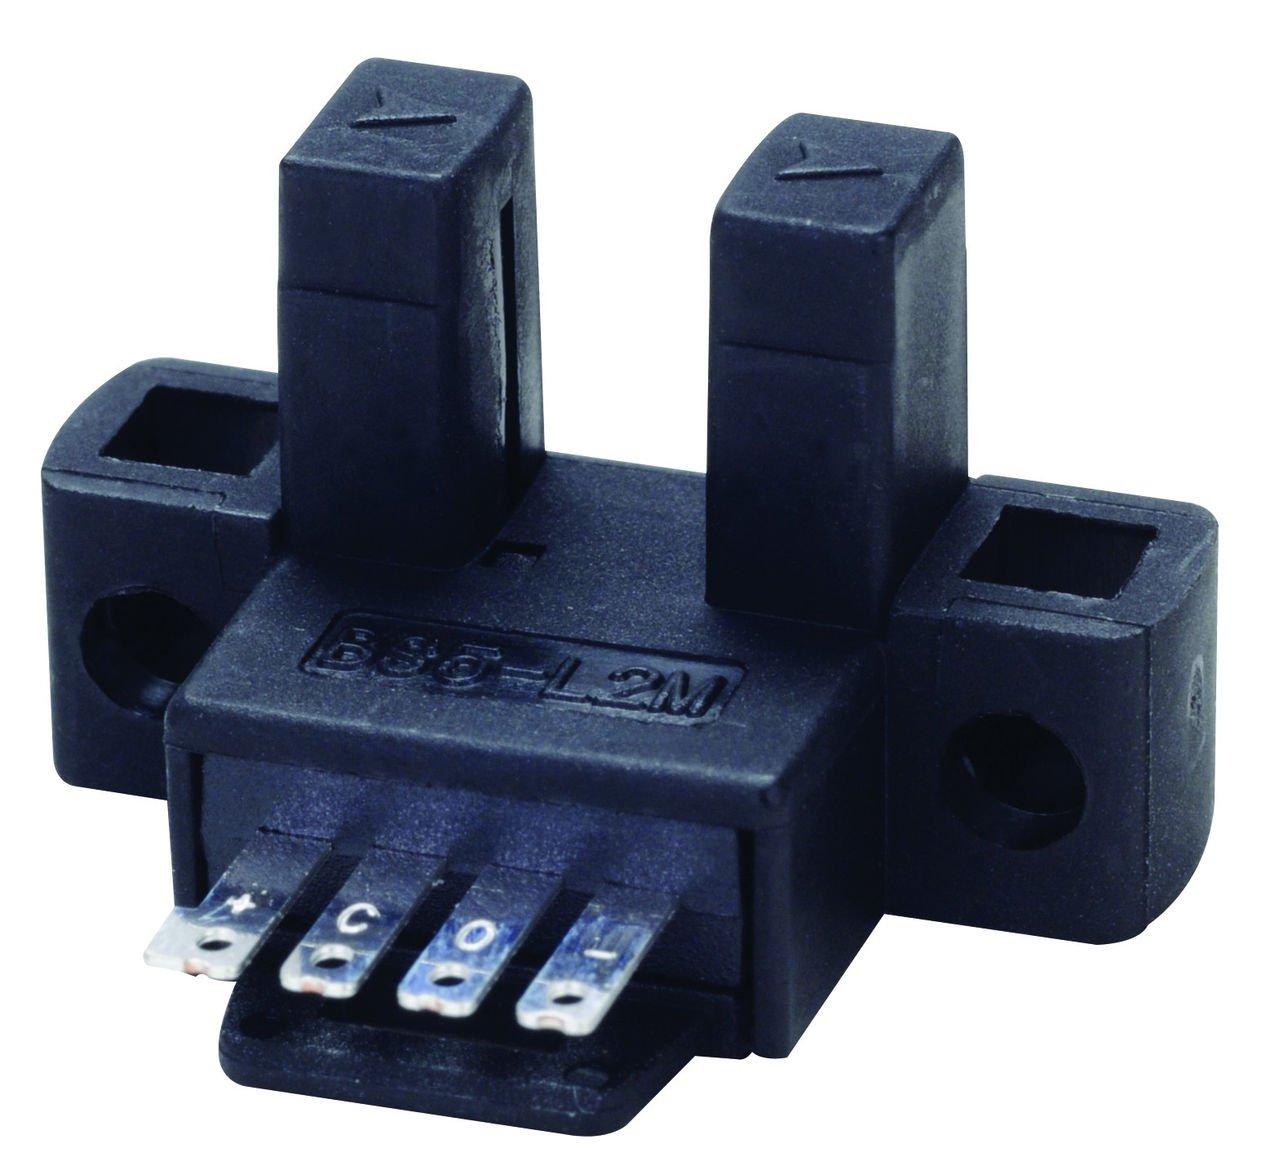 Light /& Dark On AUTONICS BS5-L2M Sensor NPN Output Photo Micro Style 5-24 VDC